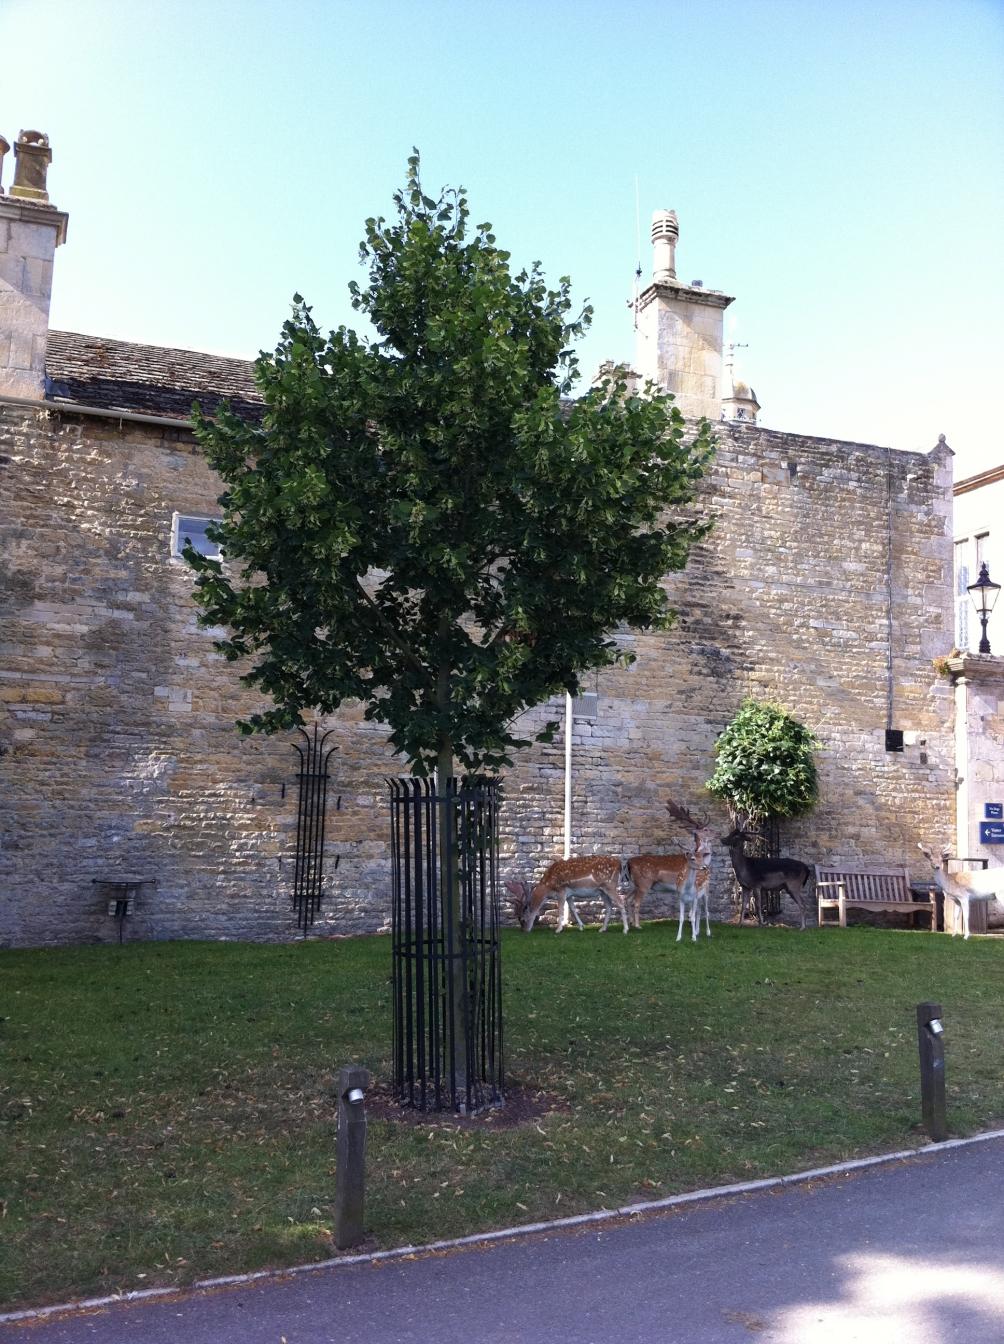 Tilia platyphyllos Rubra at Burleigh House, Stamford, Lincolnshire